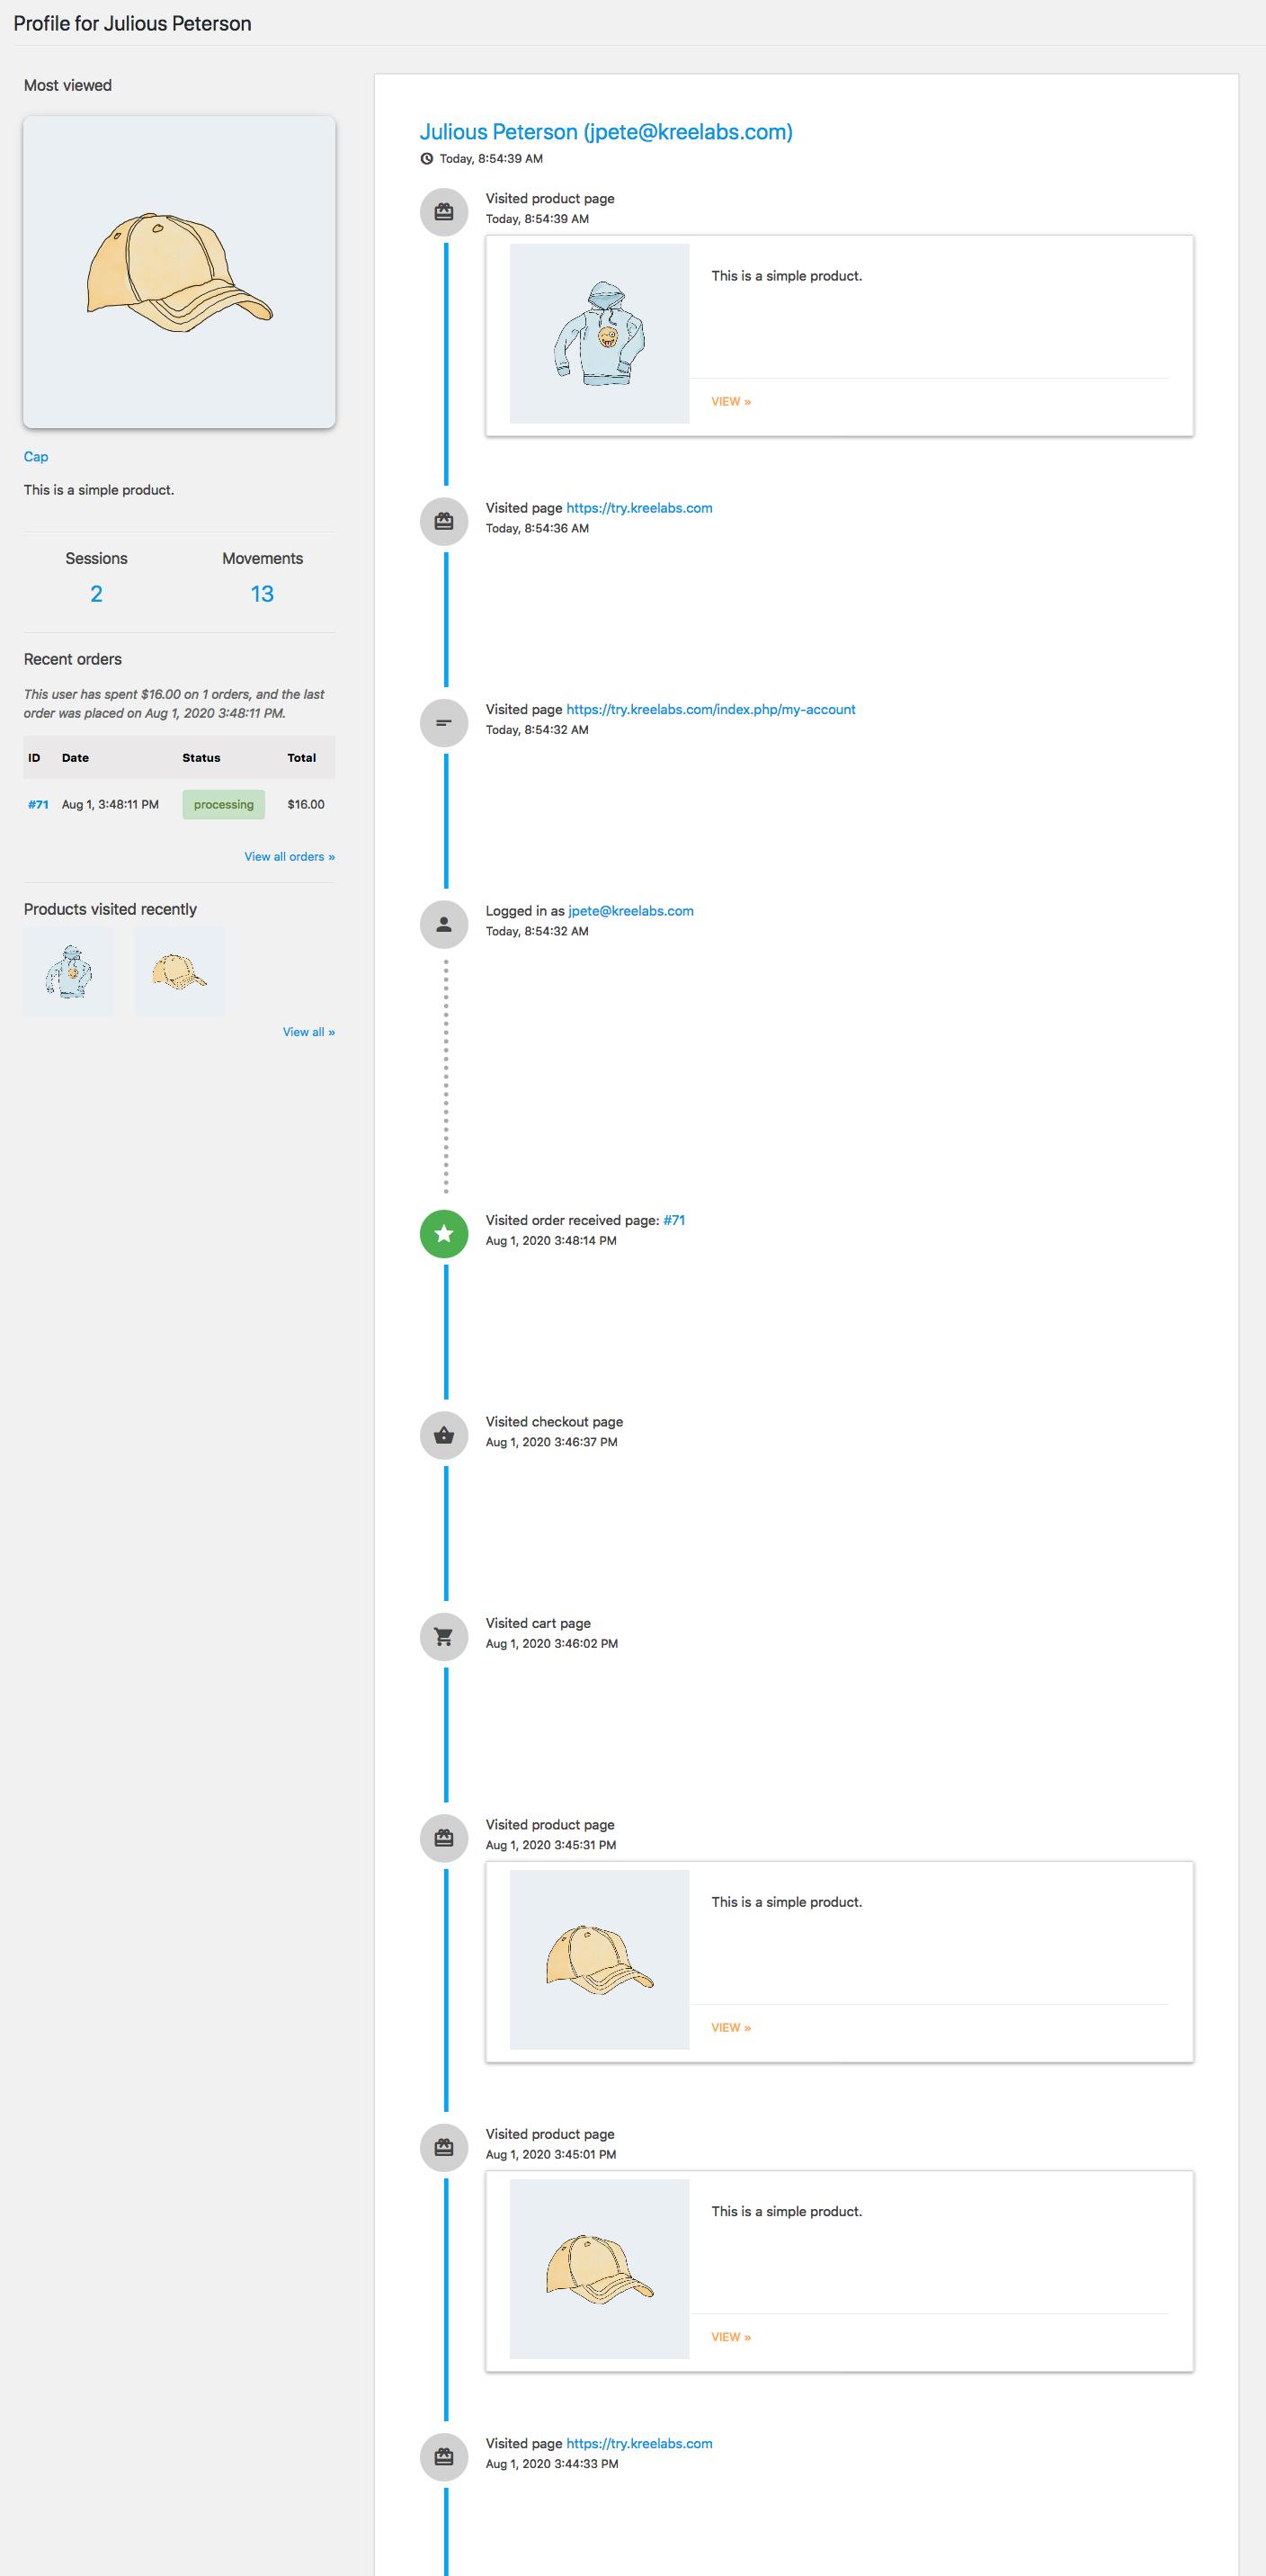 user activity profile